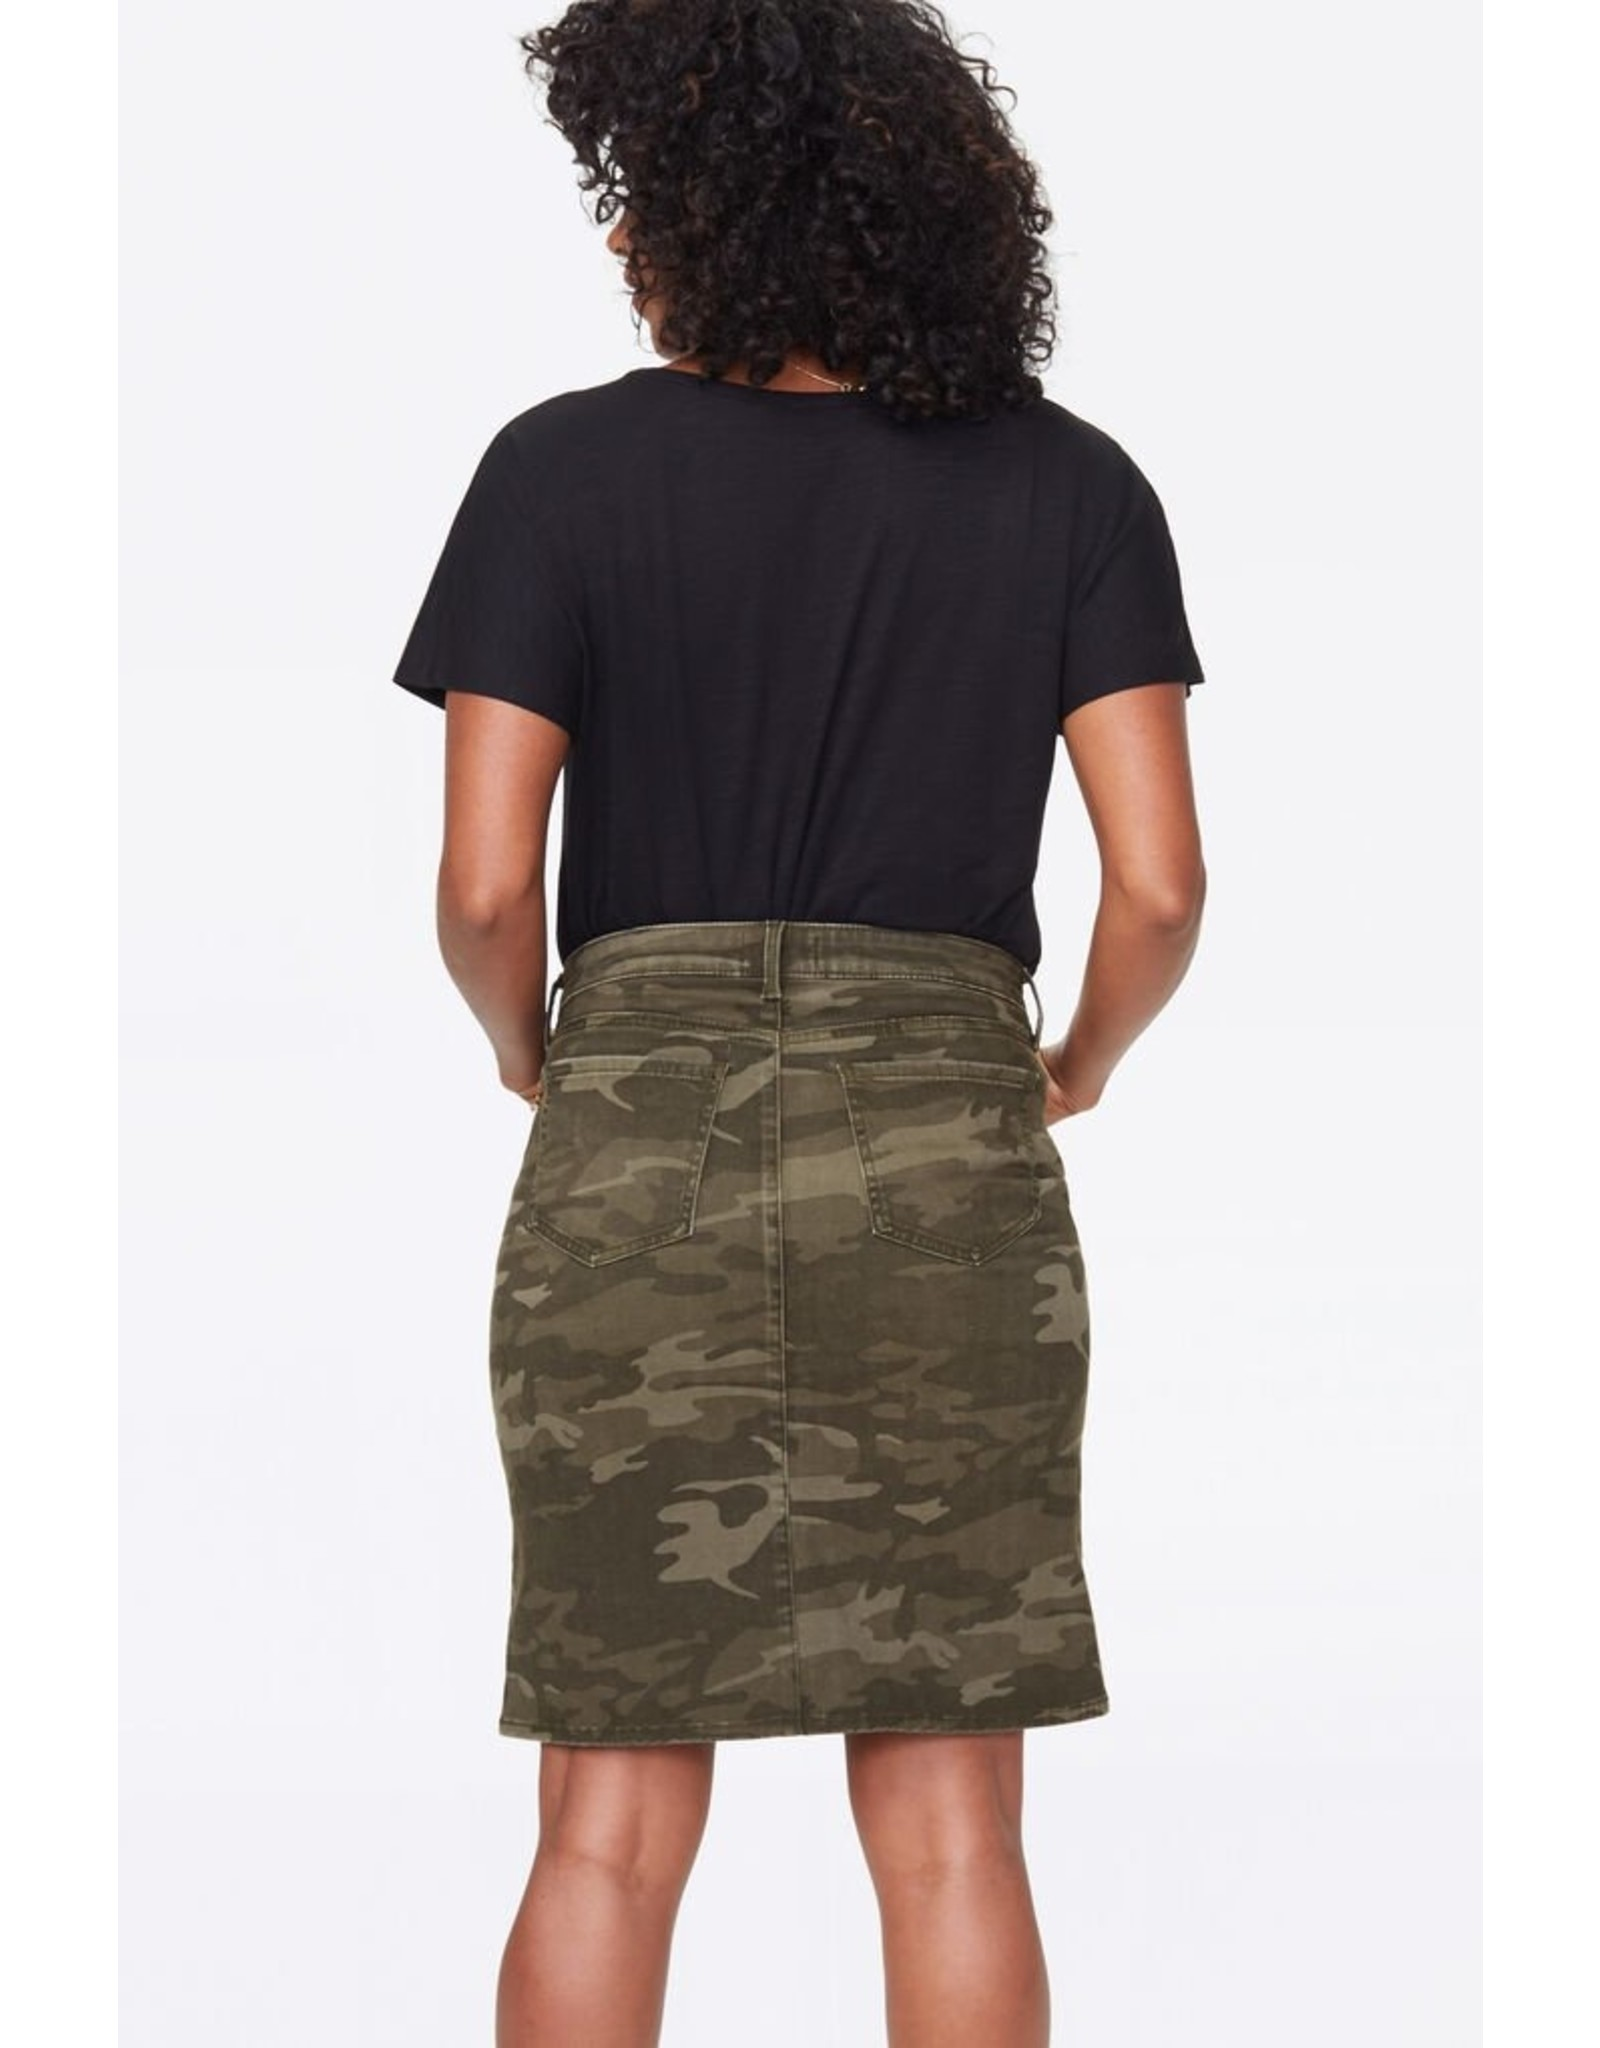 NYDJ Camo Denim Skirt